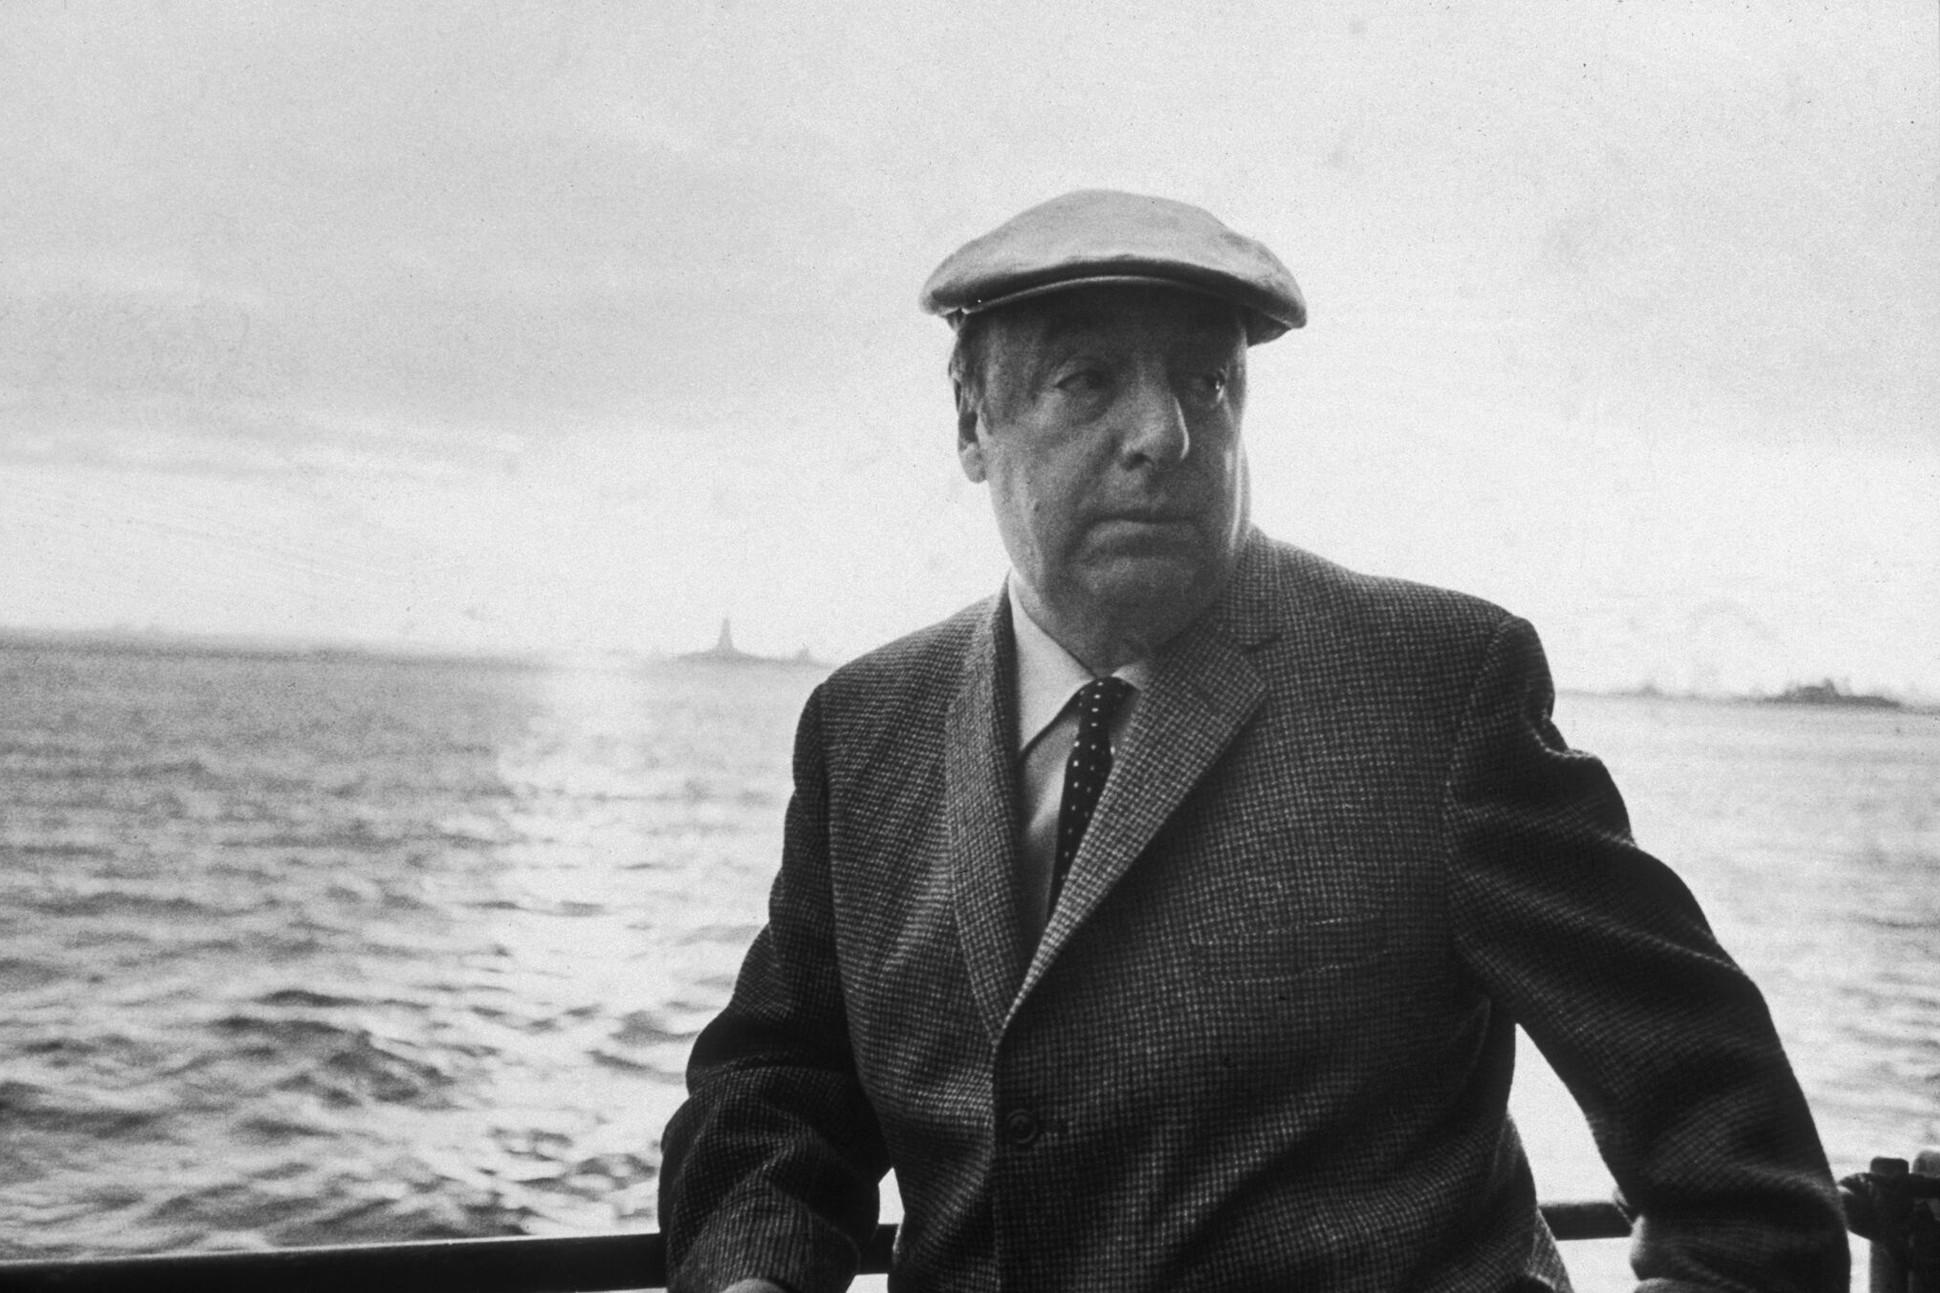 Black and white photograph of Pablo Neruda.